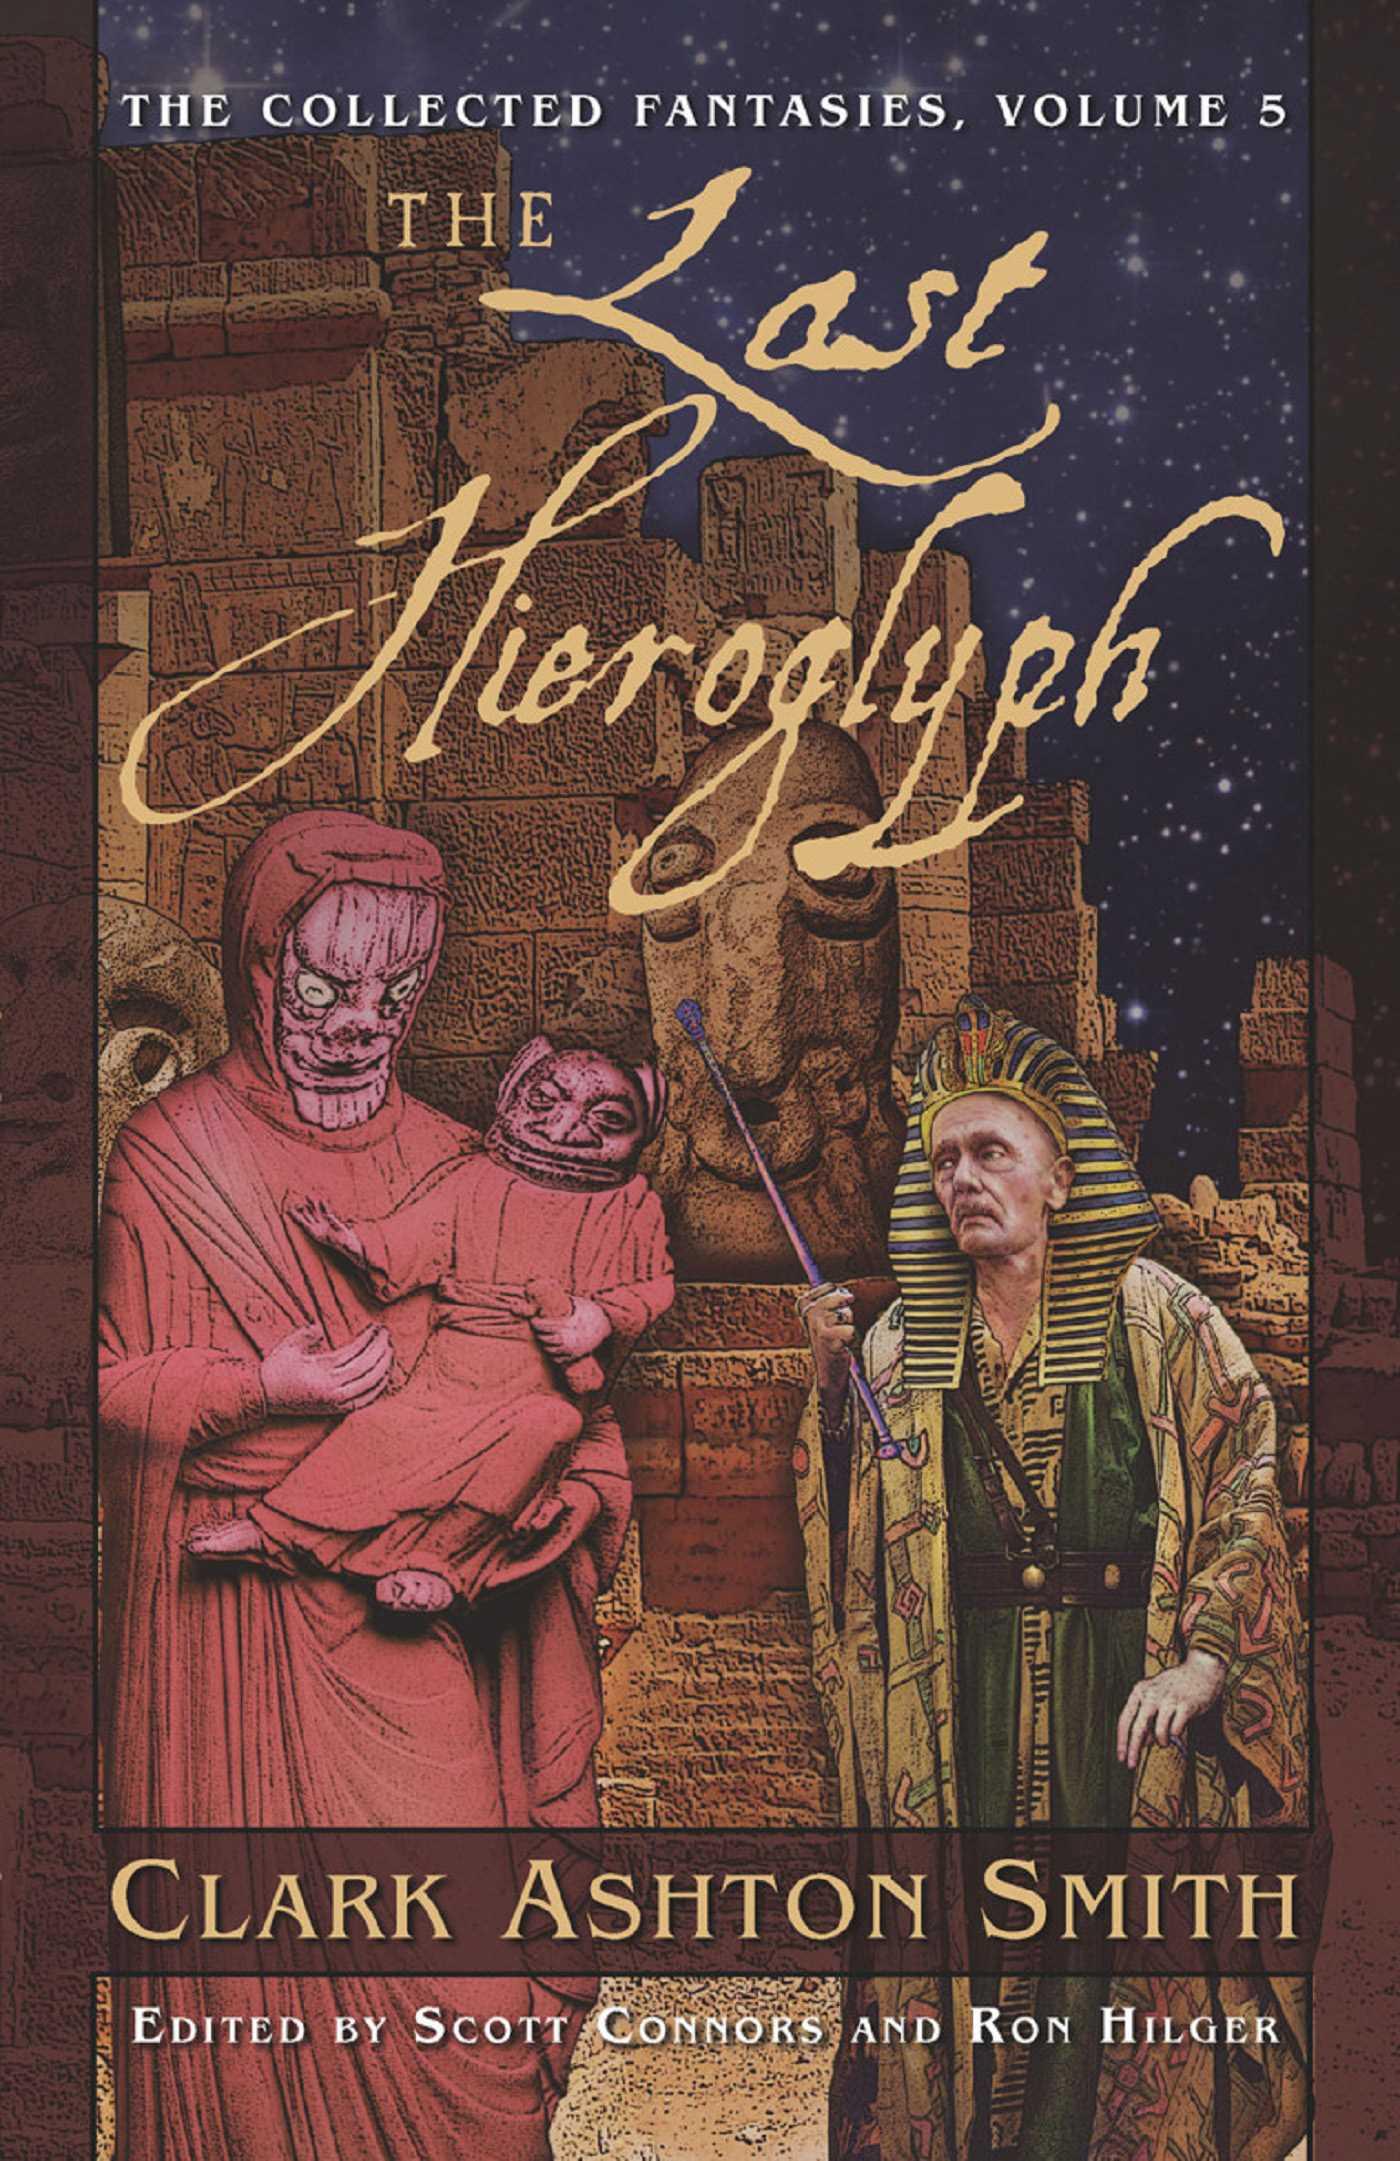 Collected Fantasies of Clark Ashton Smith: The Last Hieroglyph